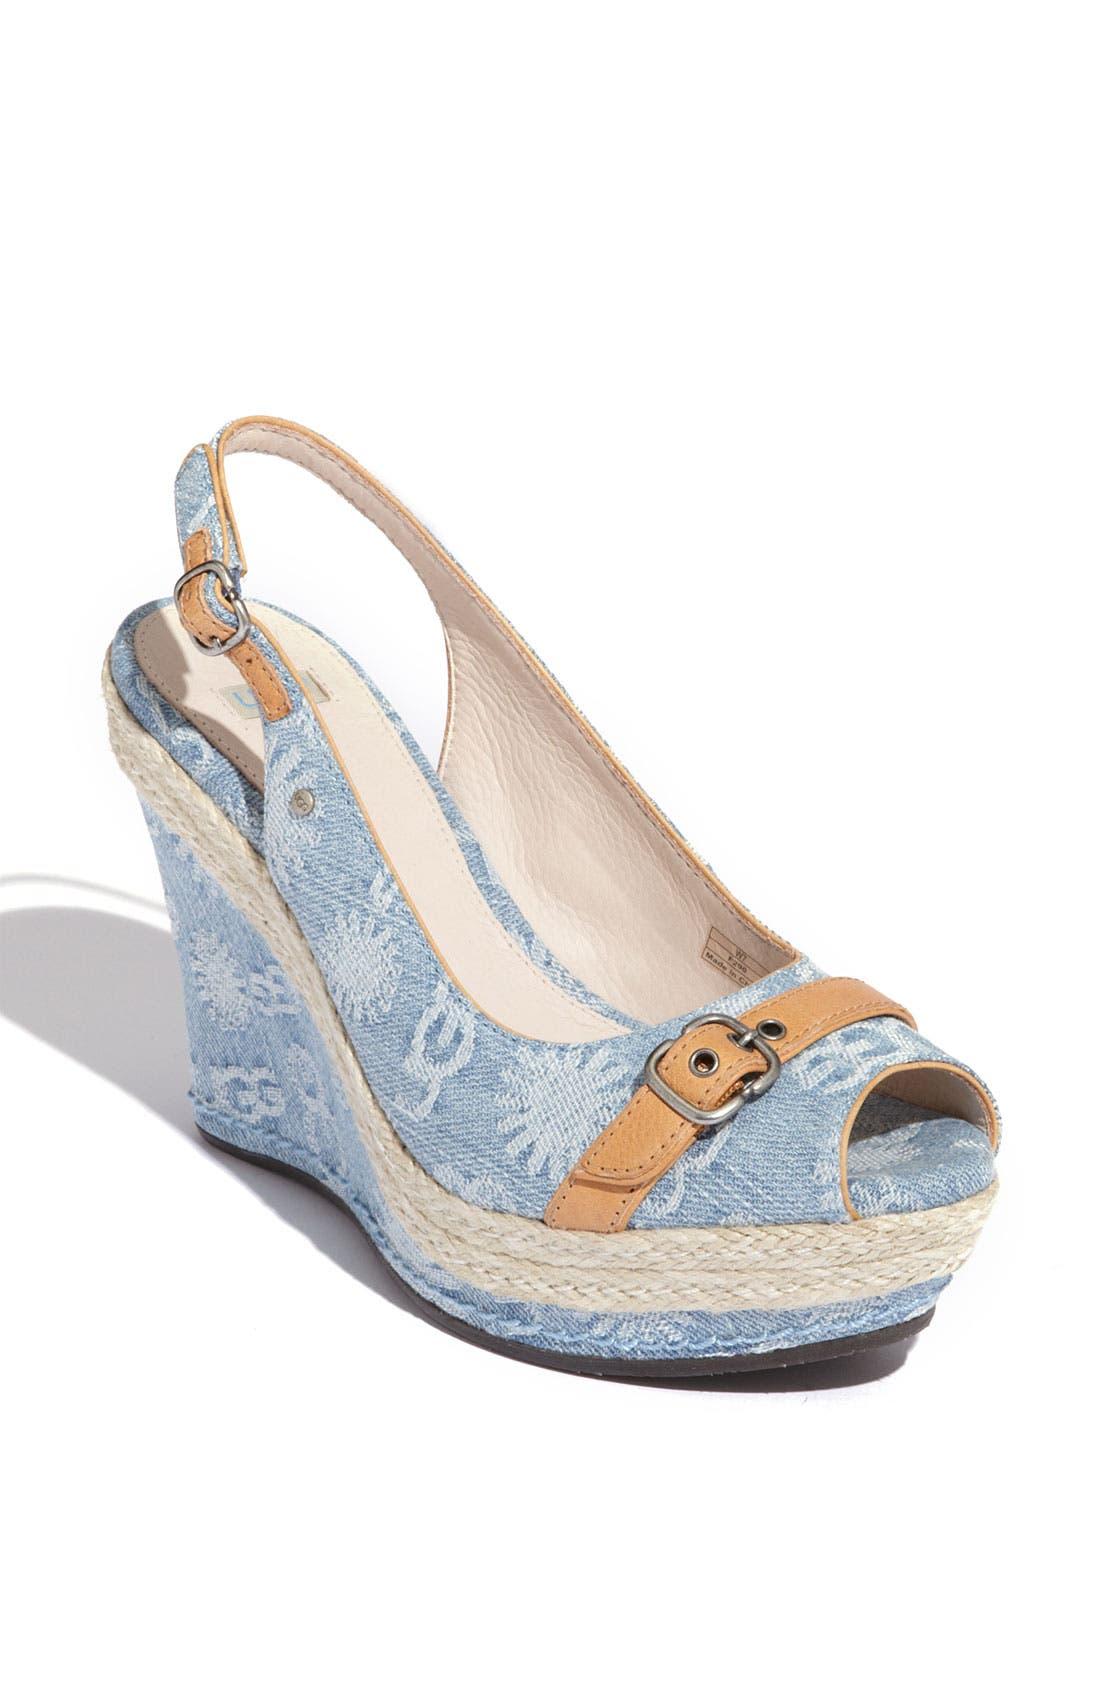 Main Image - UGG® Australia 'Noella' Sandal